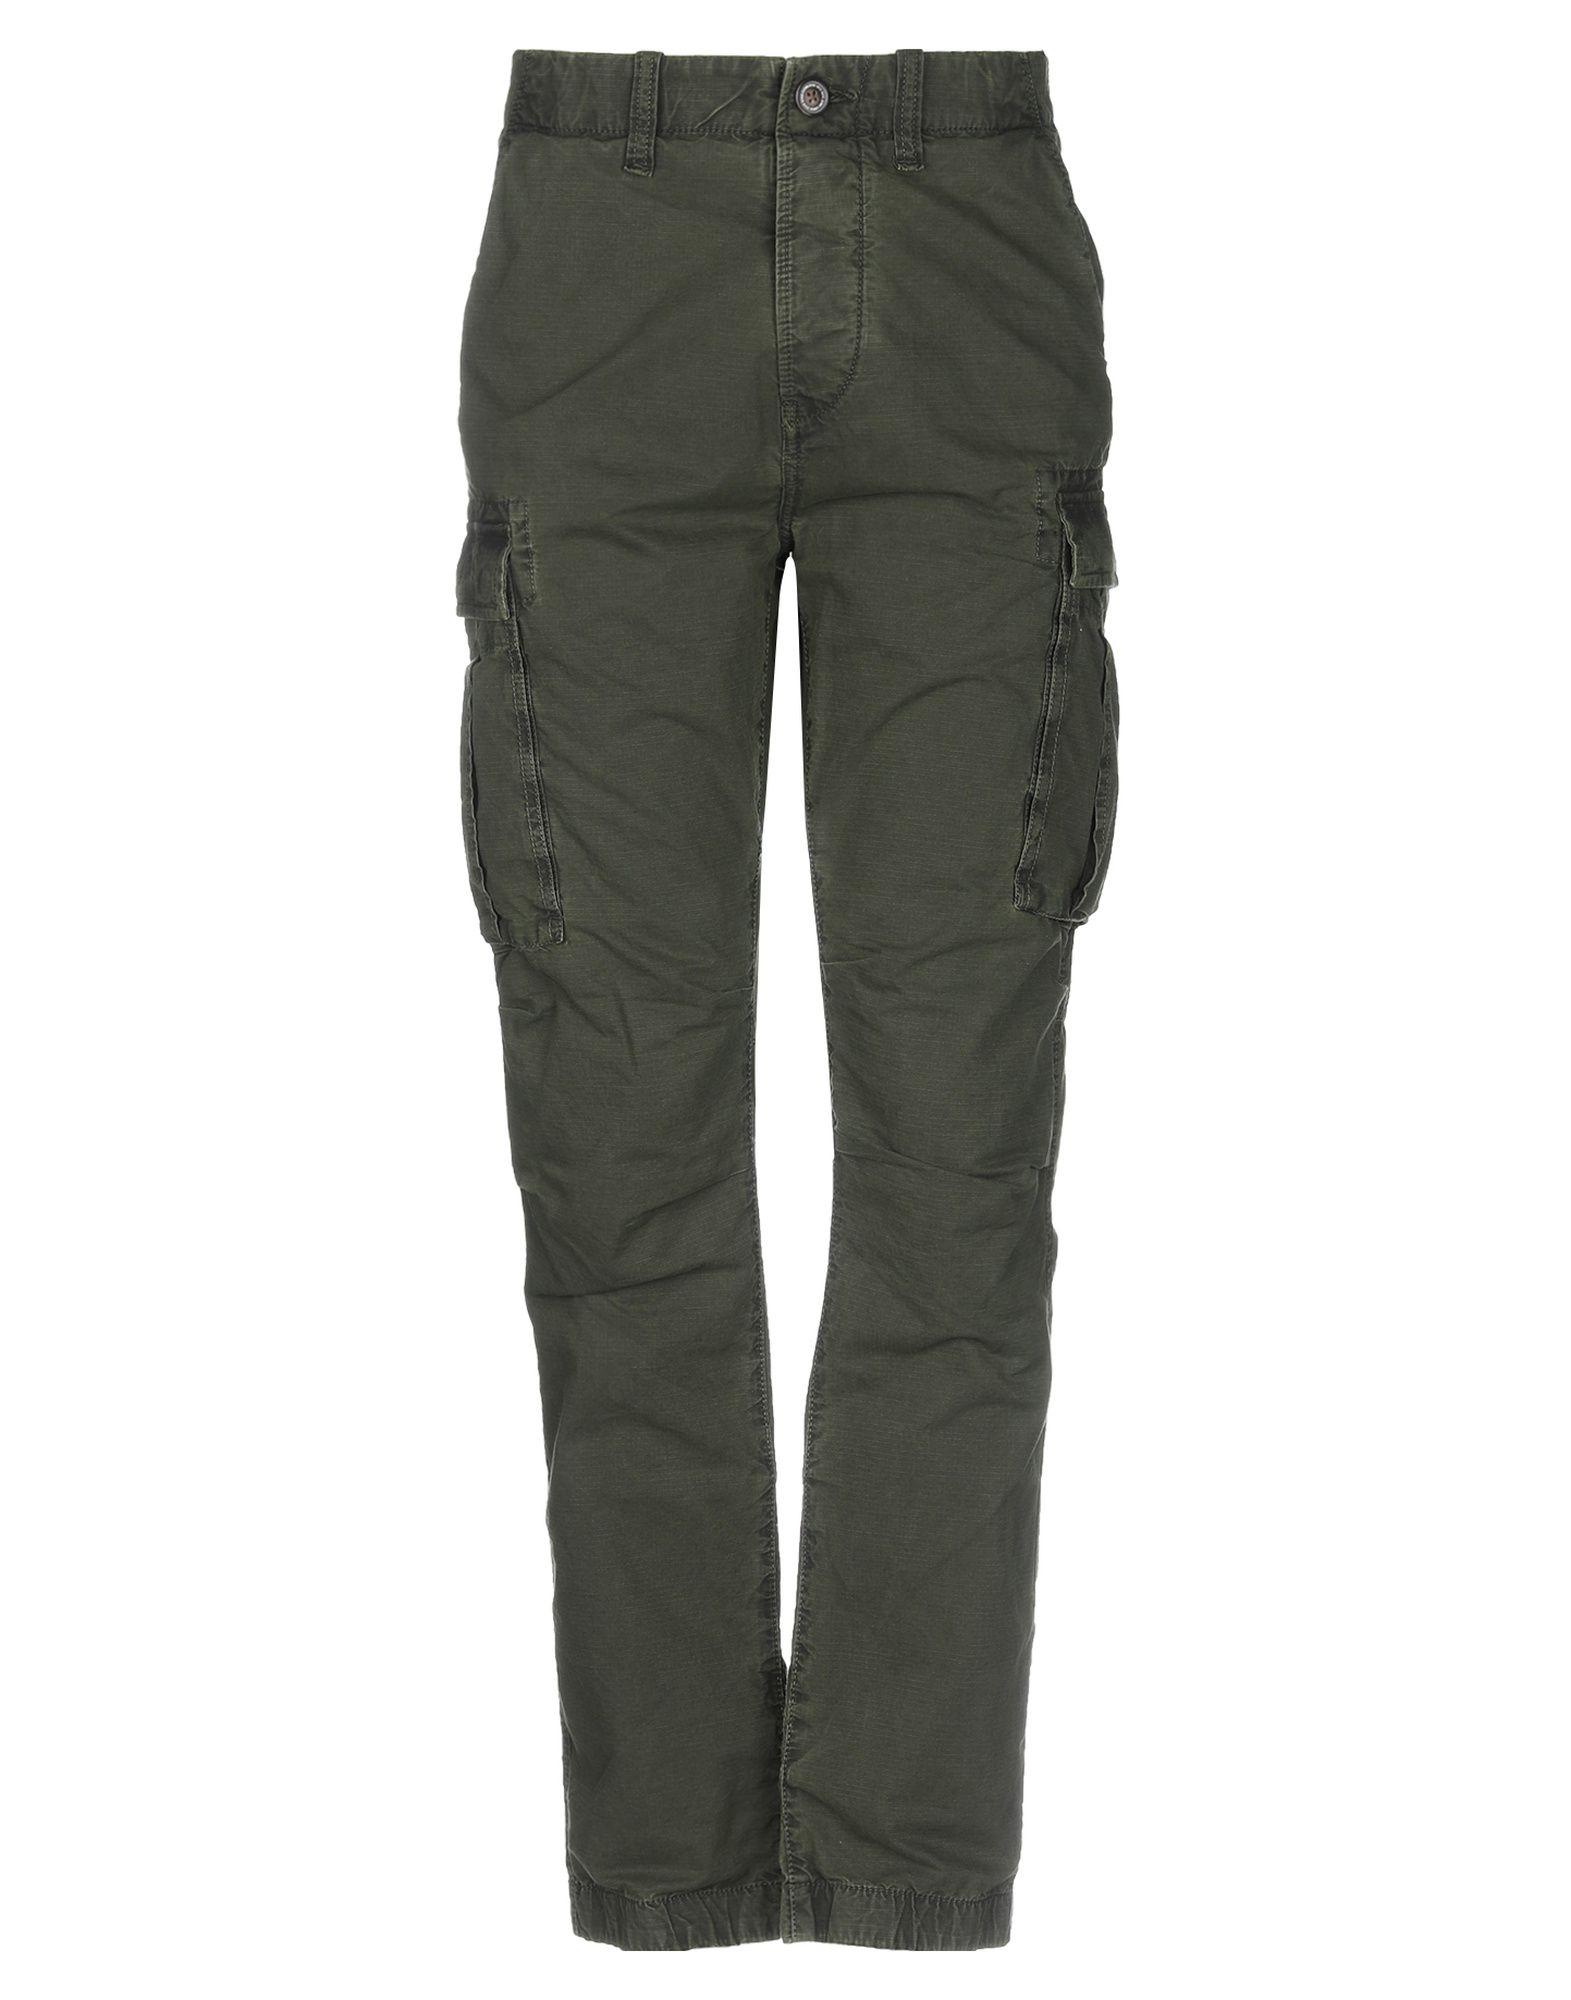 Cargo Pepe Jeans uomo - 13309694VG 13309694VG 13309694VG 5ed